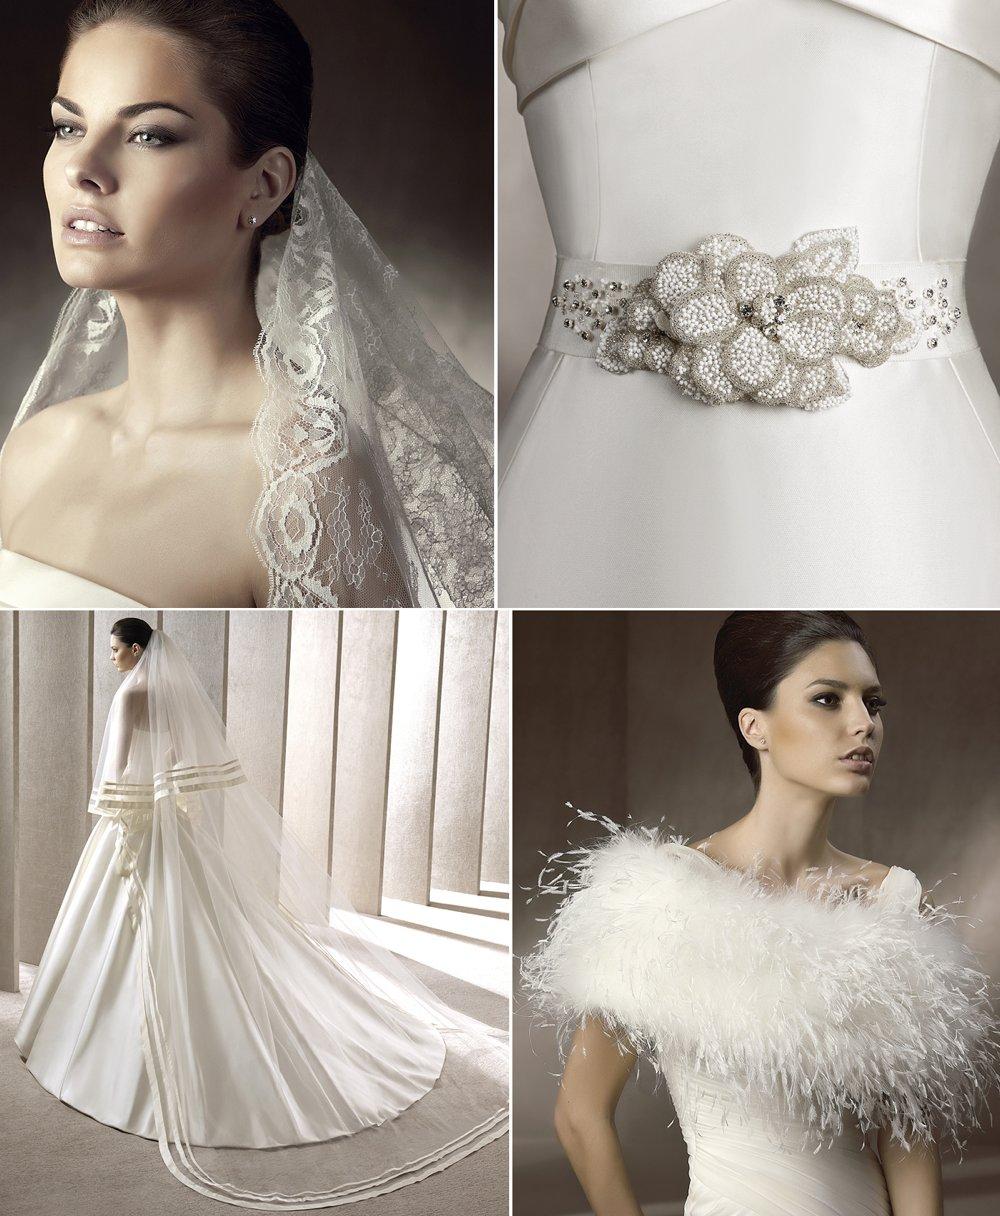 Wedding-dress-accessories-pronovias-2012.full